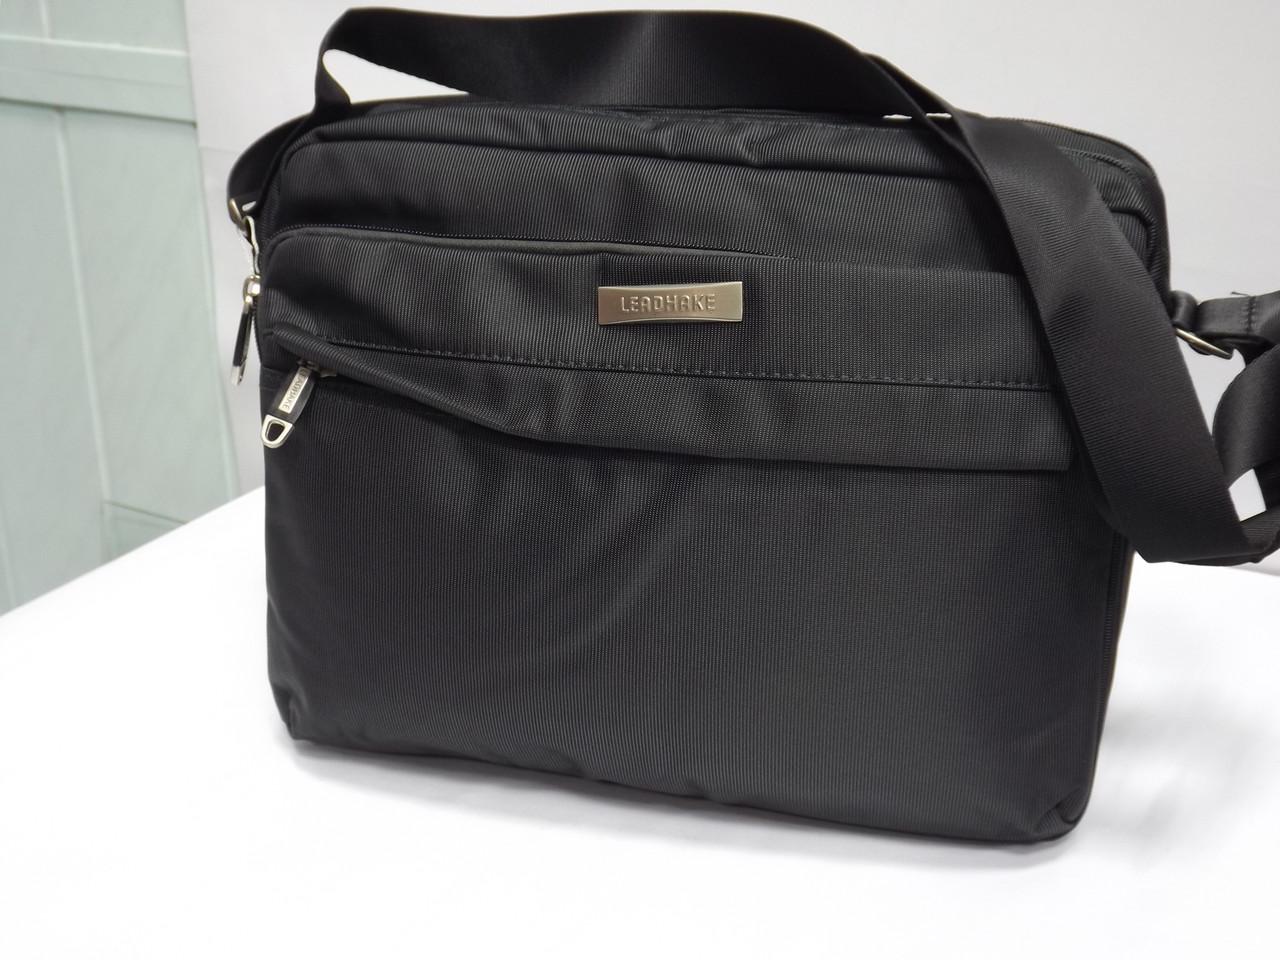 ff746b0f5ccb Мужская текстильная сумка для ноутбука через плечо Leadhake 6211 ...